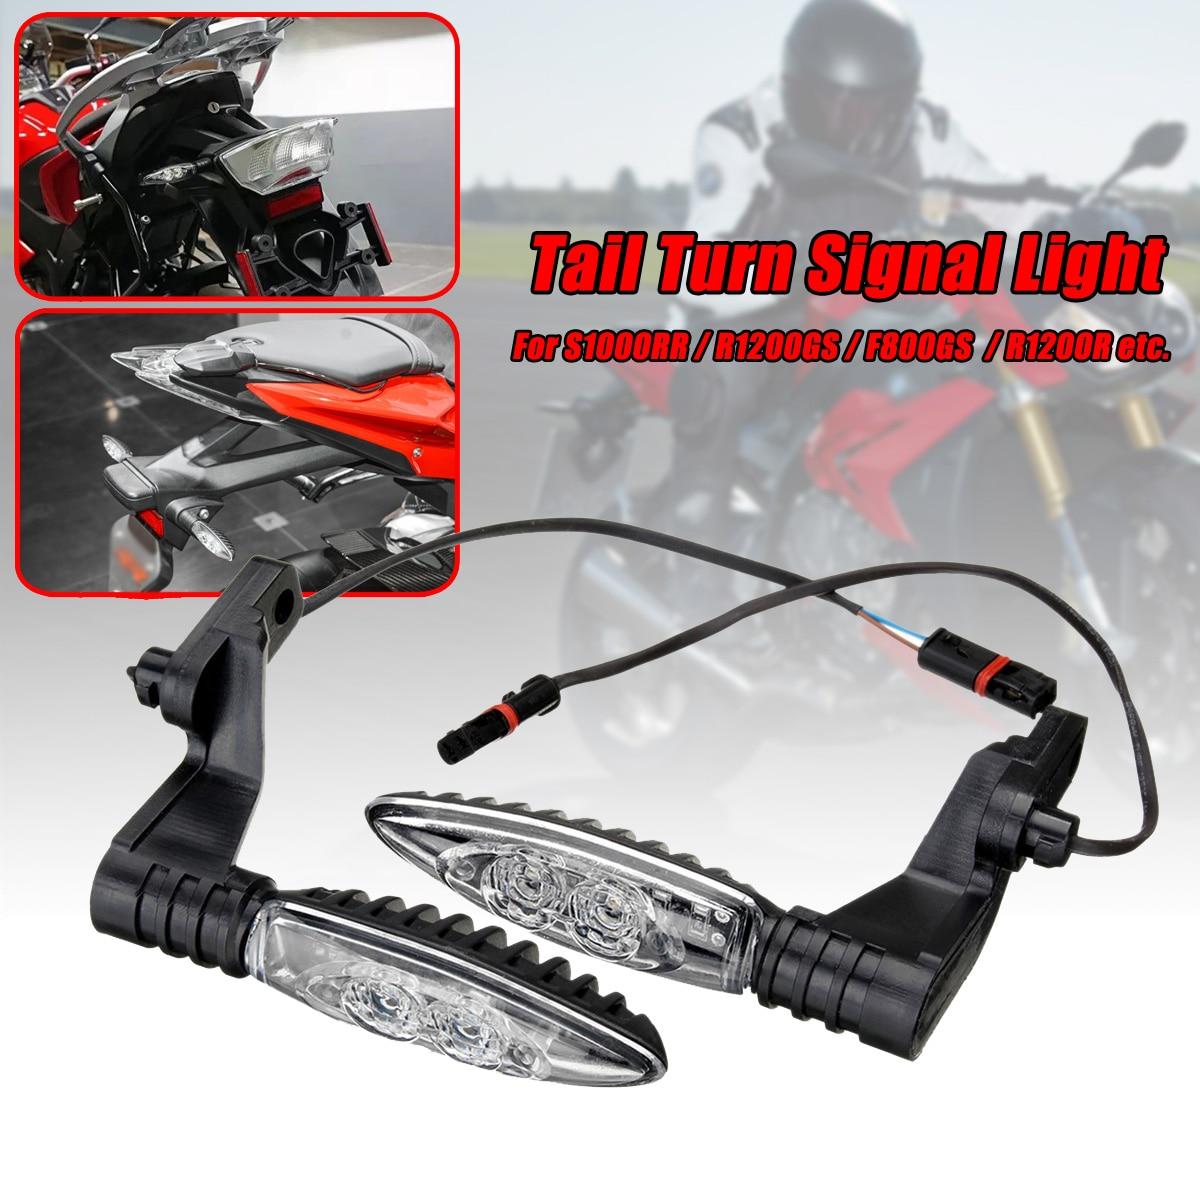 4pcs 12V Motorcycle Rear LED Turn Signal Indicator Lights Motorbike Tail Flashing Blinker for BMW S1000RR R1200GS F800GS s1000rr turn led lights